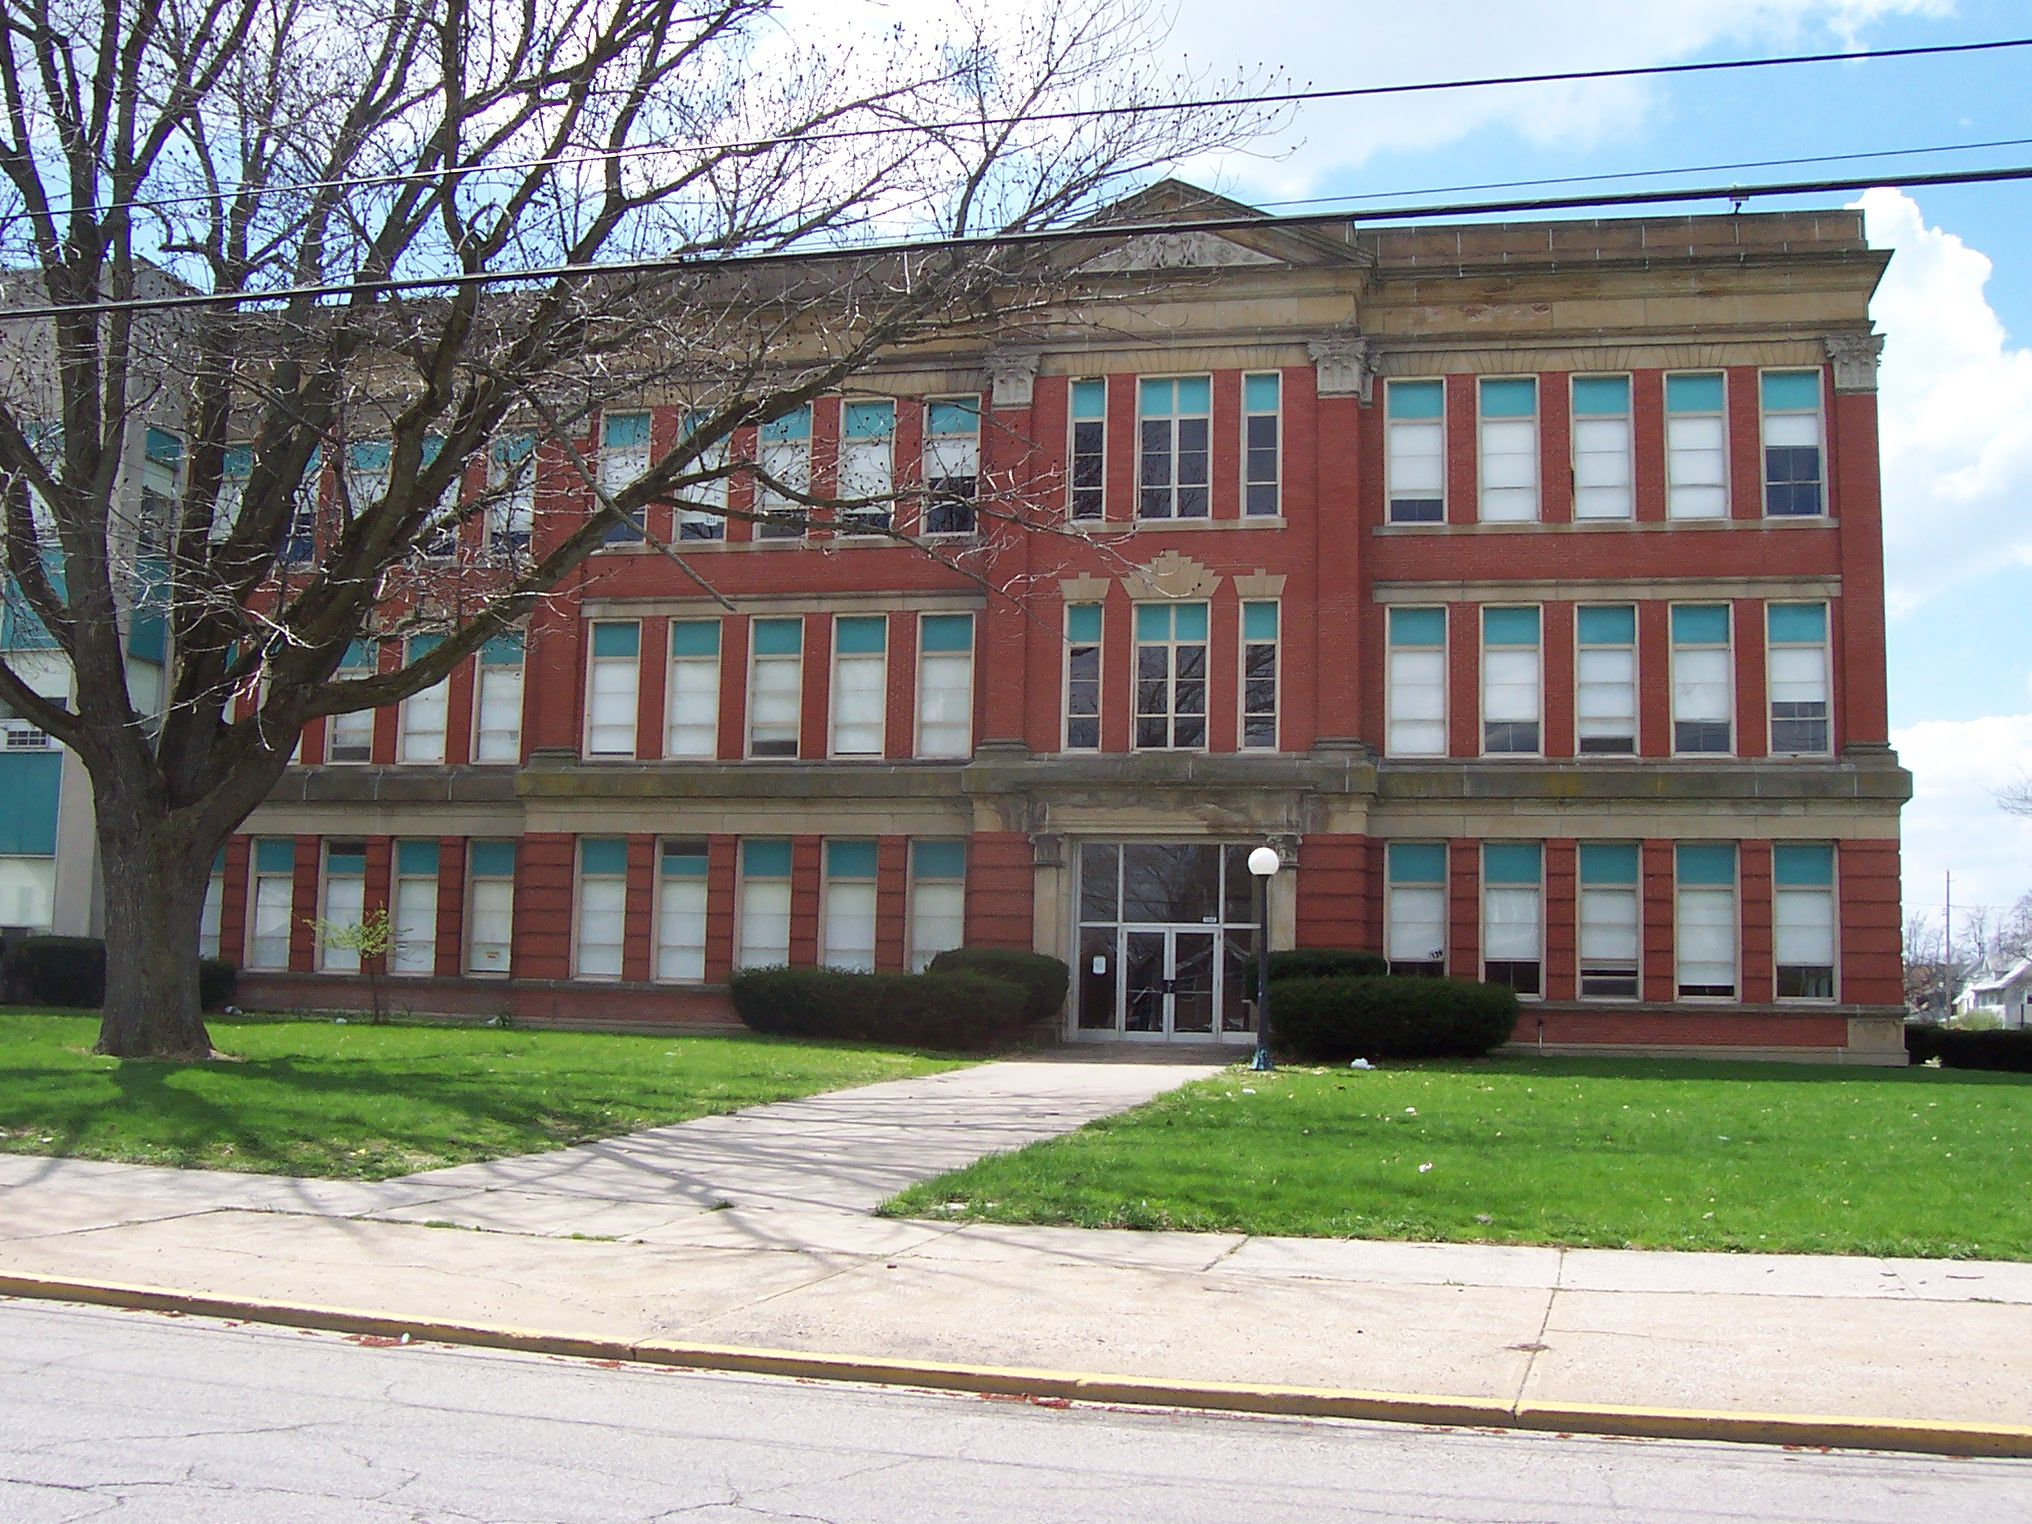 Lorain High School Lorain Ohio Lorain Amherst Ohio